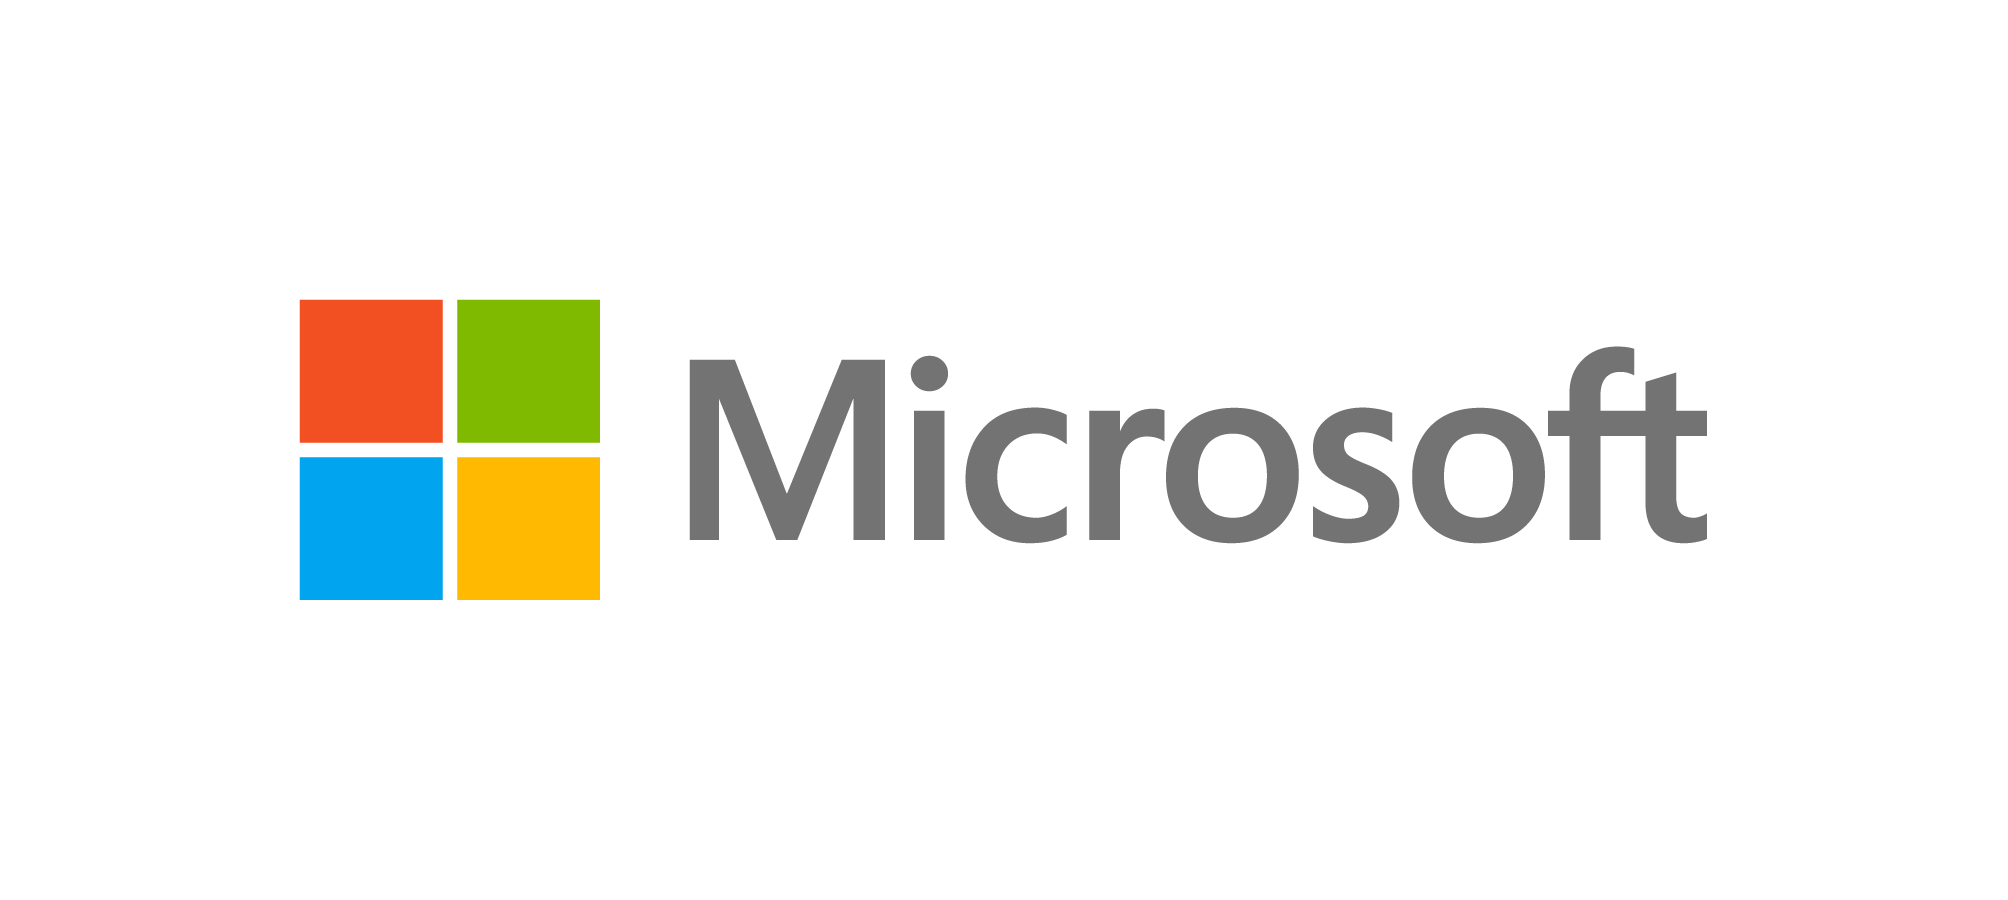 Microsoft logo | Popular logos